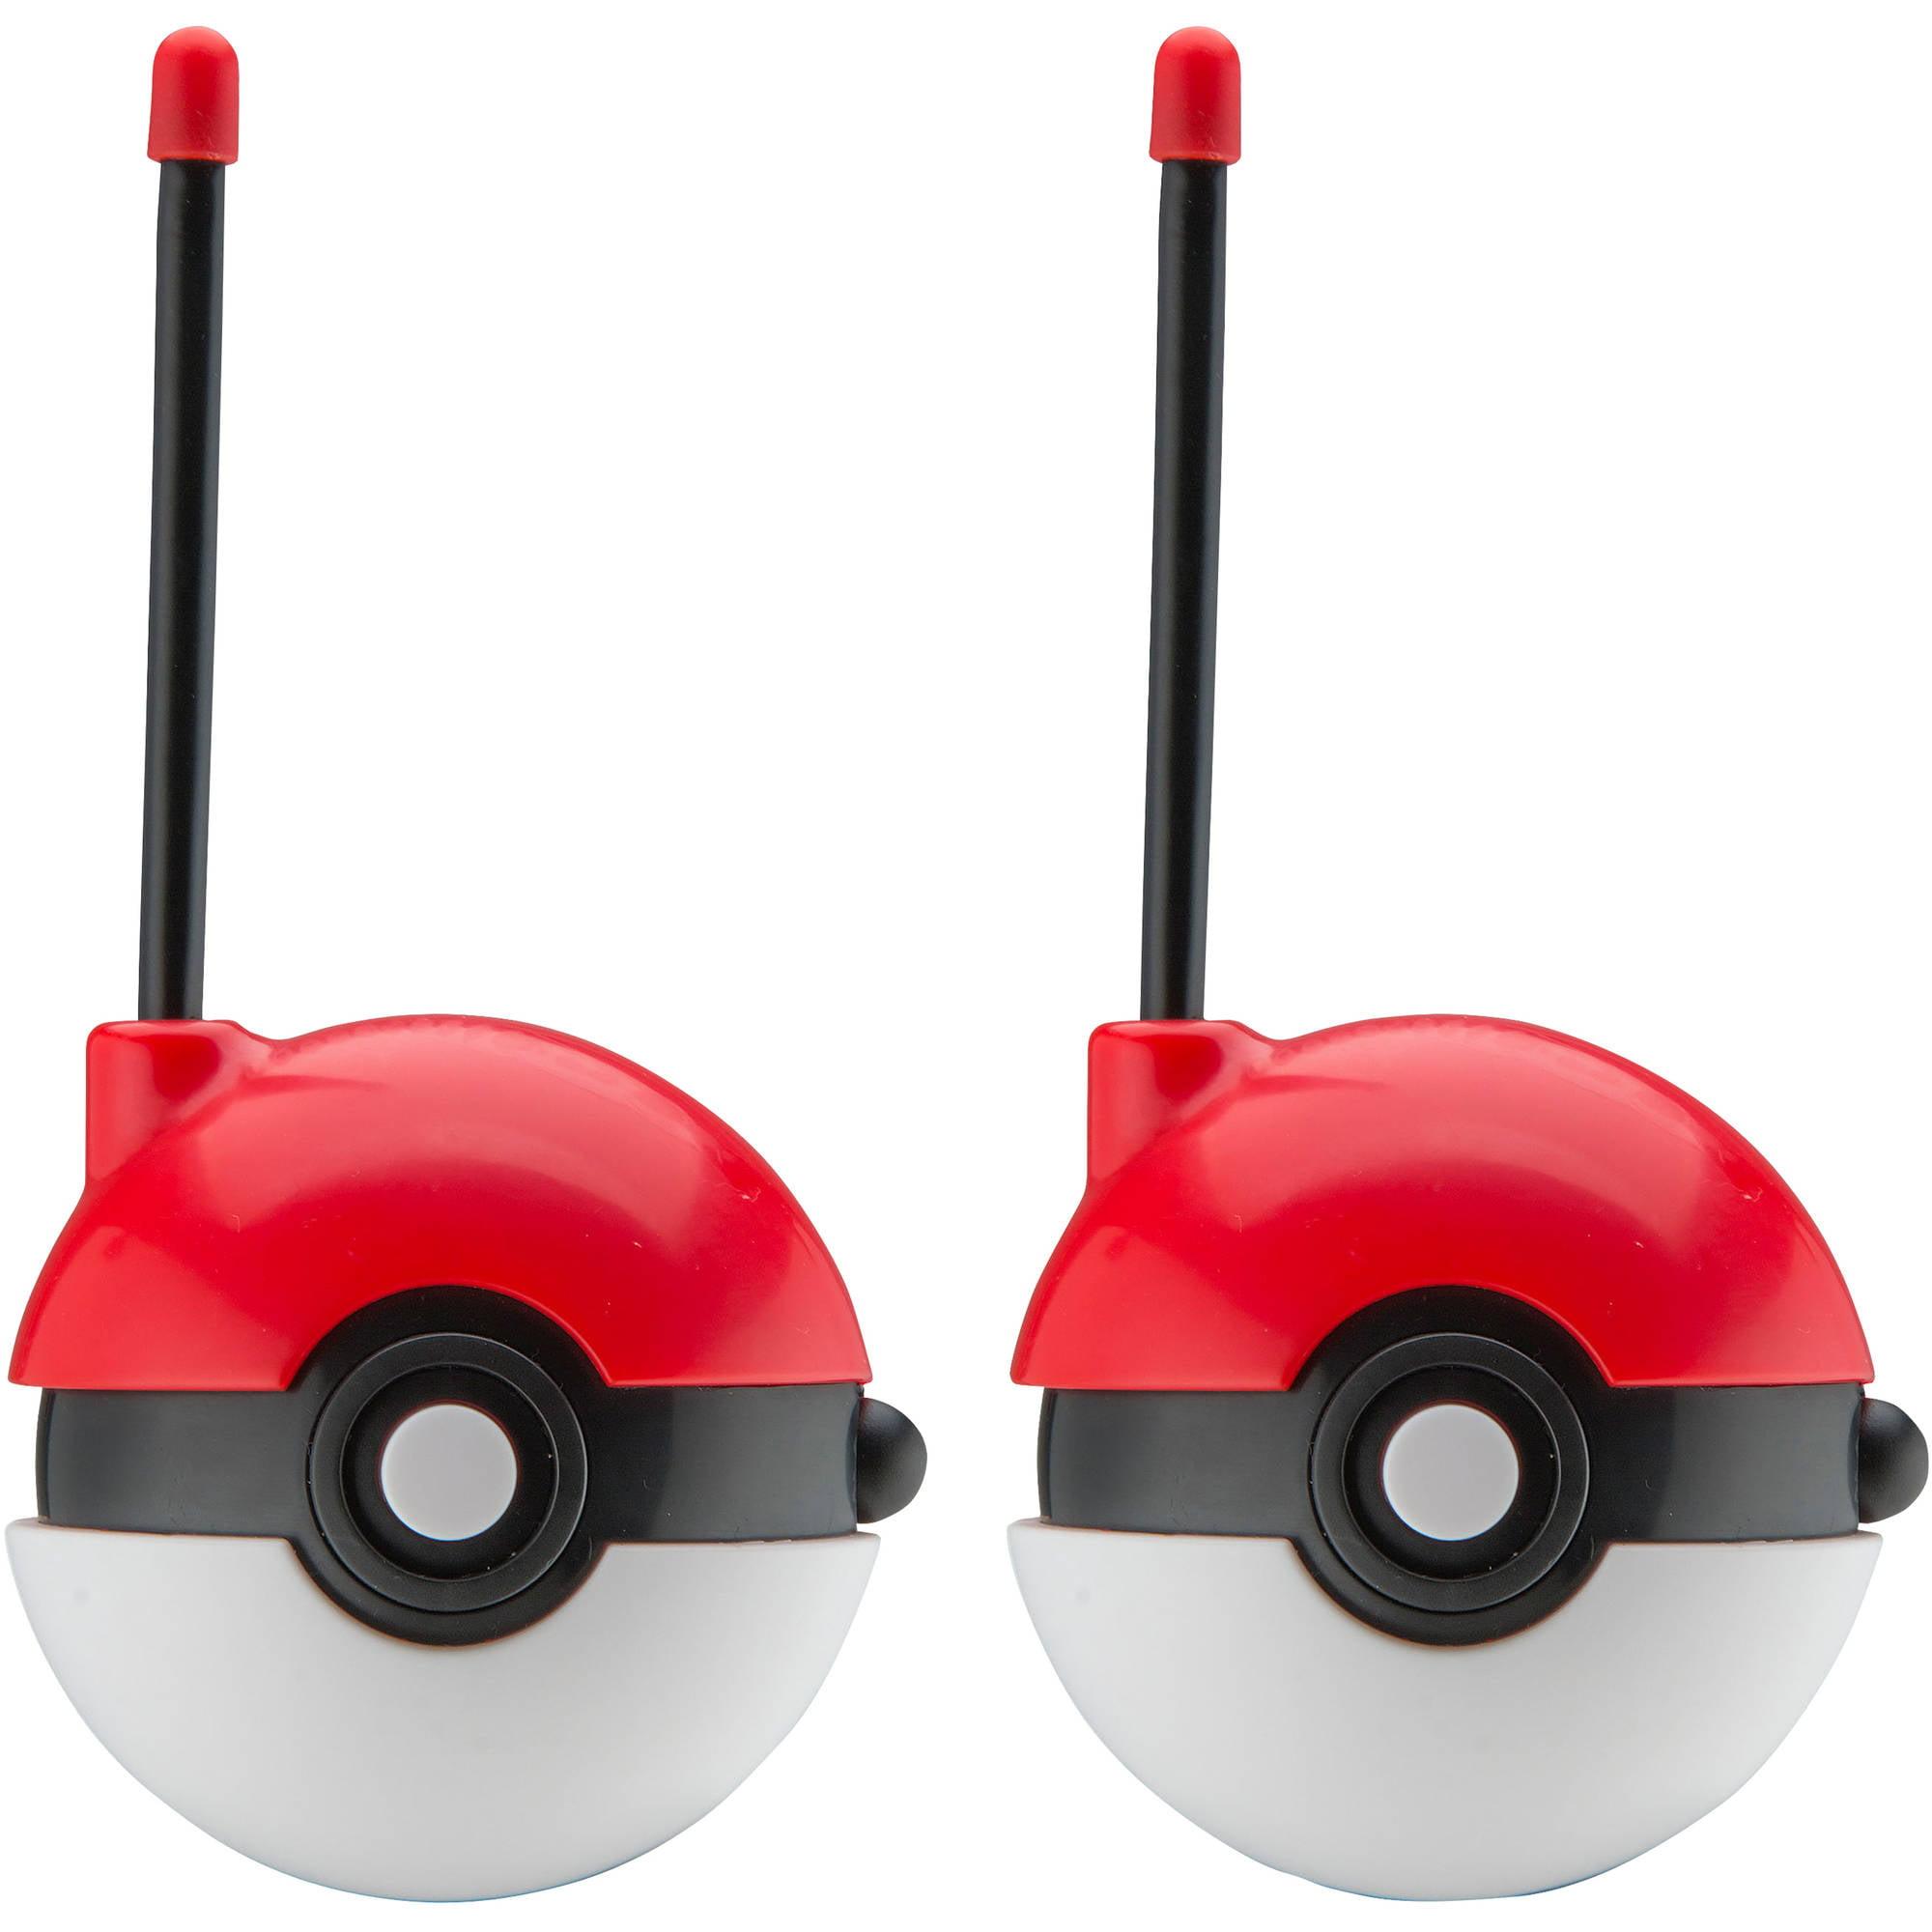 Pokemon Character Short-Range Walkie Talkies